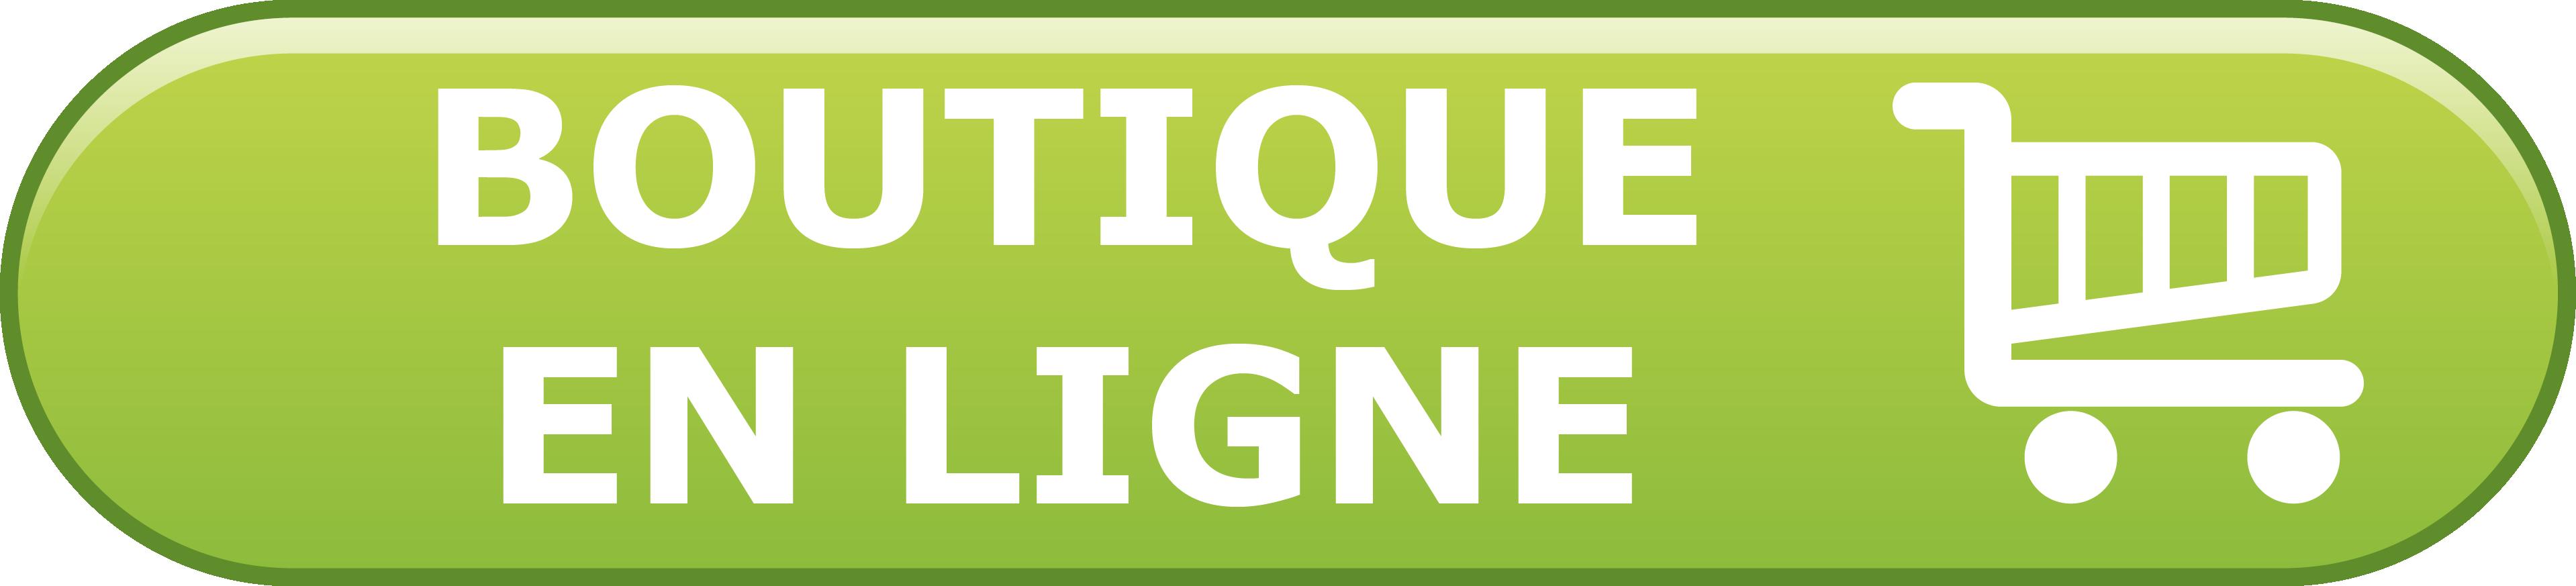 telecharger-savon-saponification-bio-artisanal